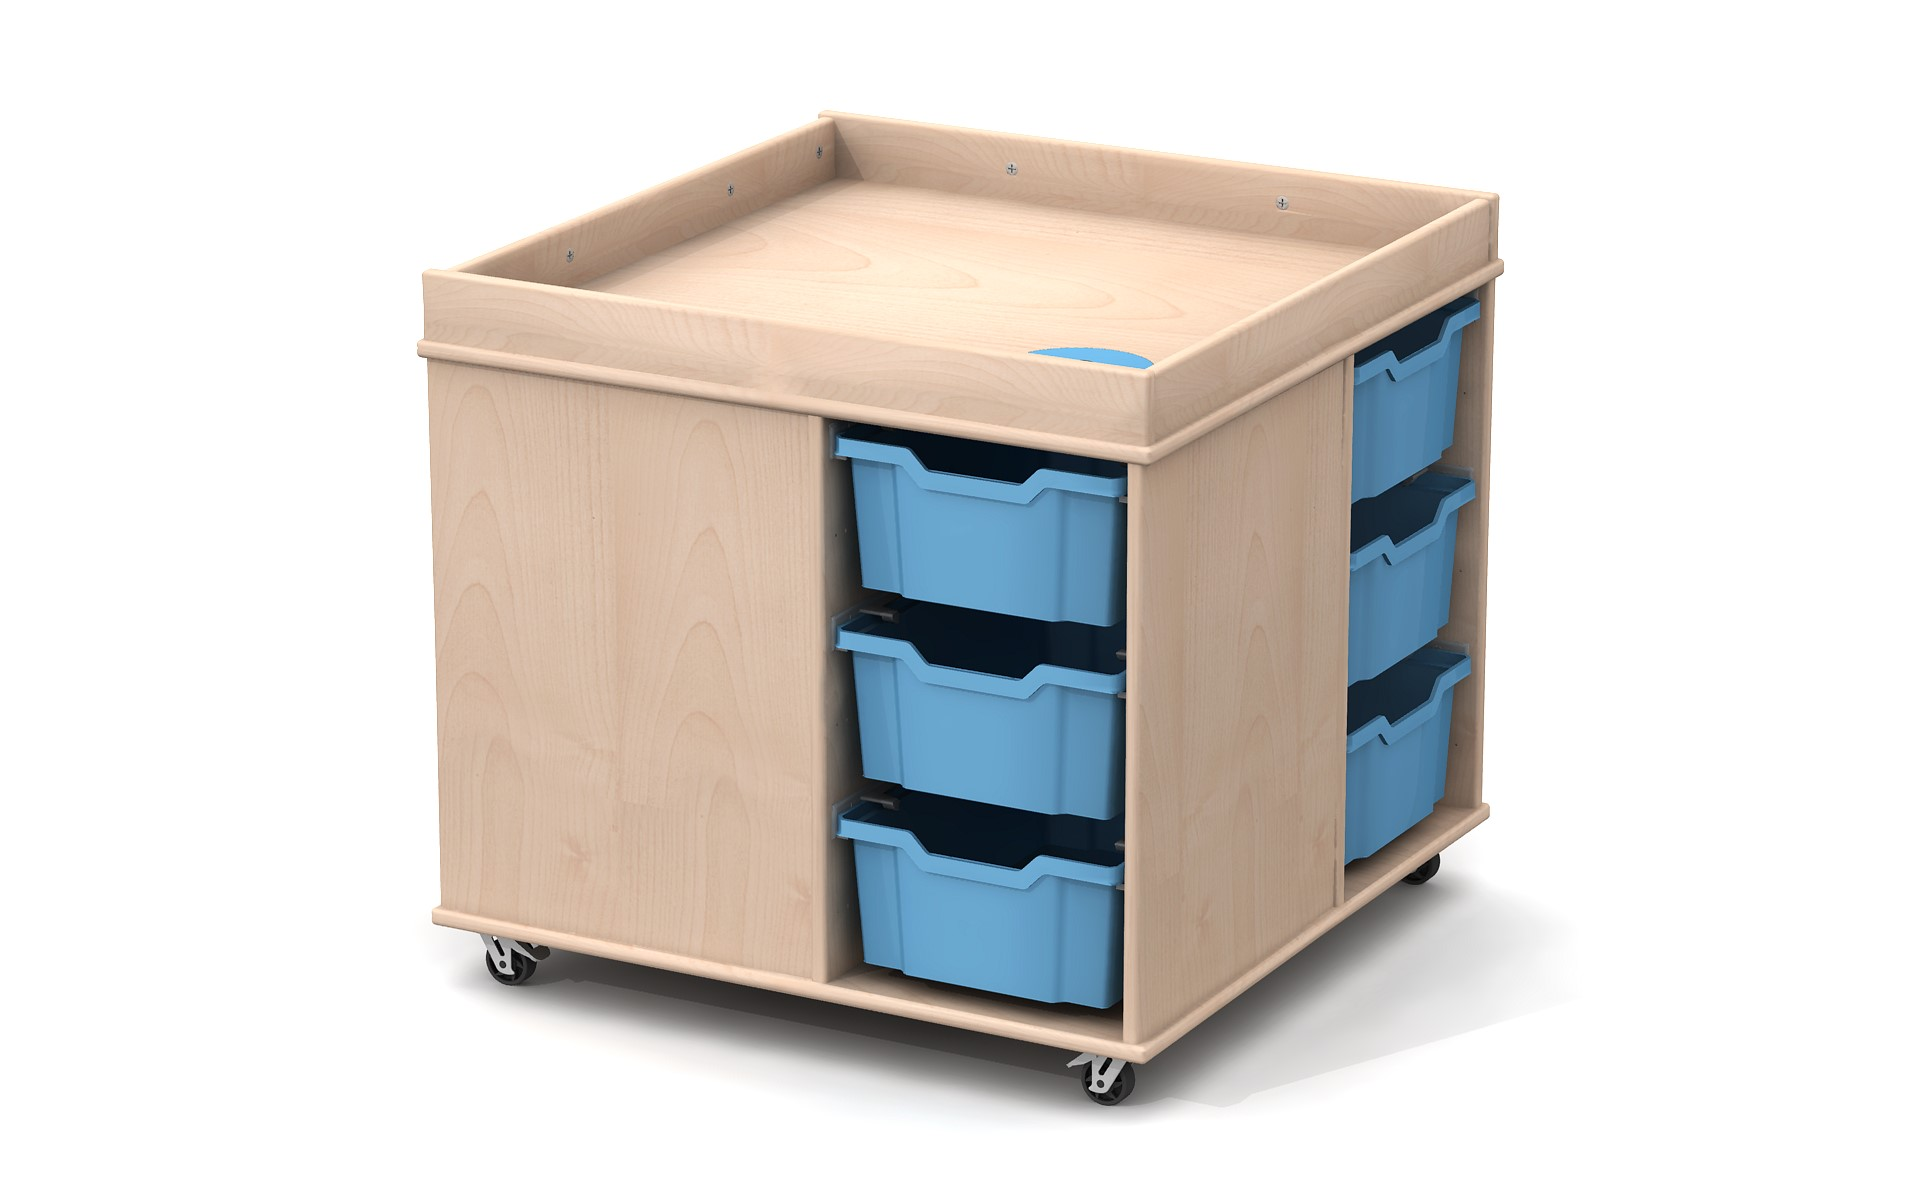 table de manipulation multifonctions par ludesign ludomania. Black Bedroom Furniture Sets. Home Design Ideas